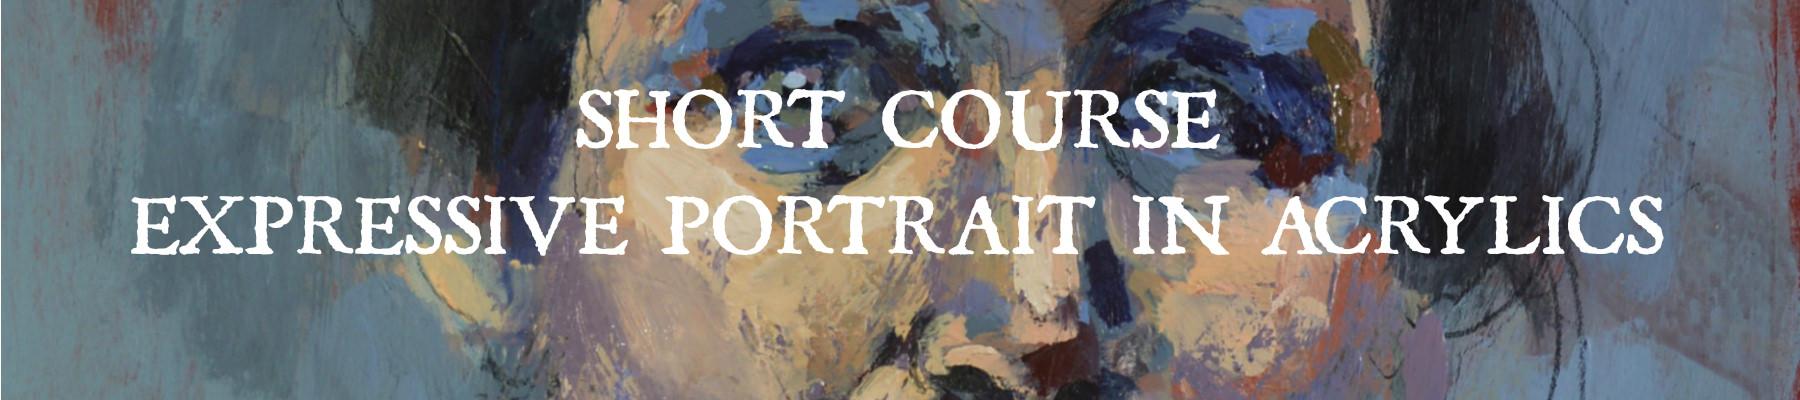 Gillian Lee Smith Expressive Portrait in Acrylics Short Course